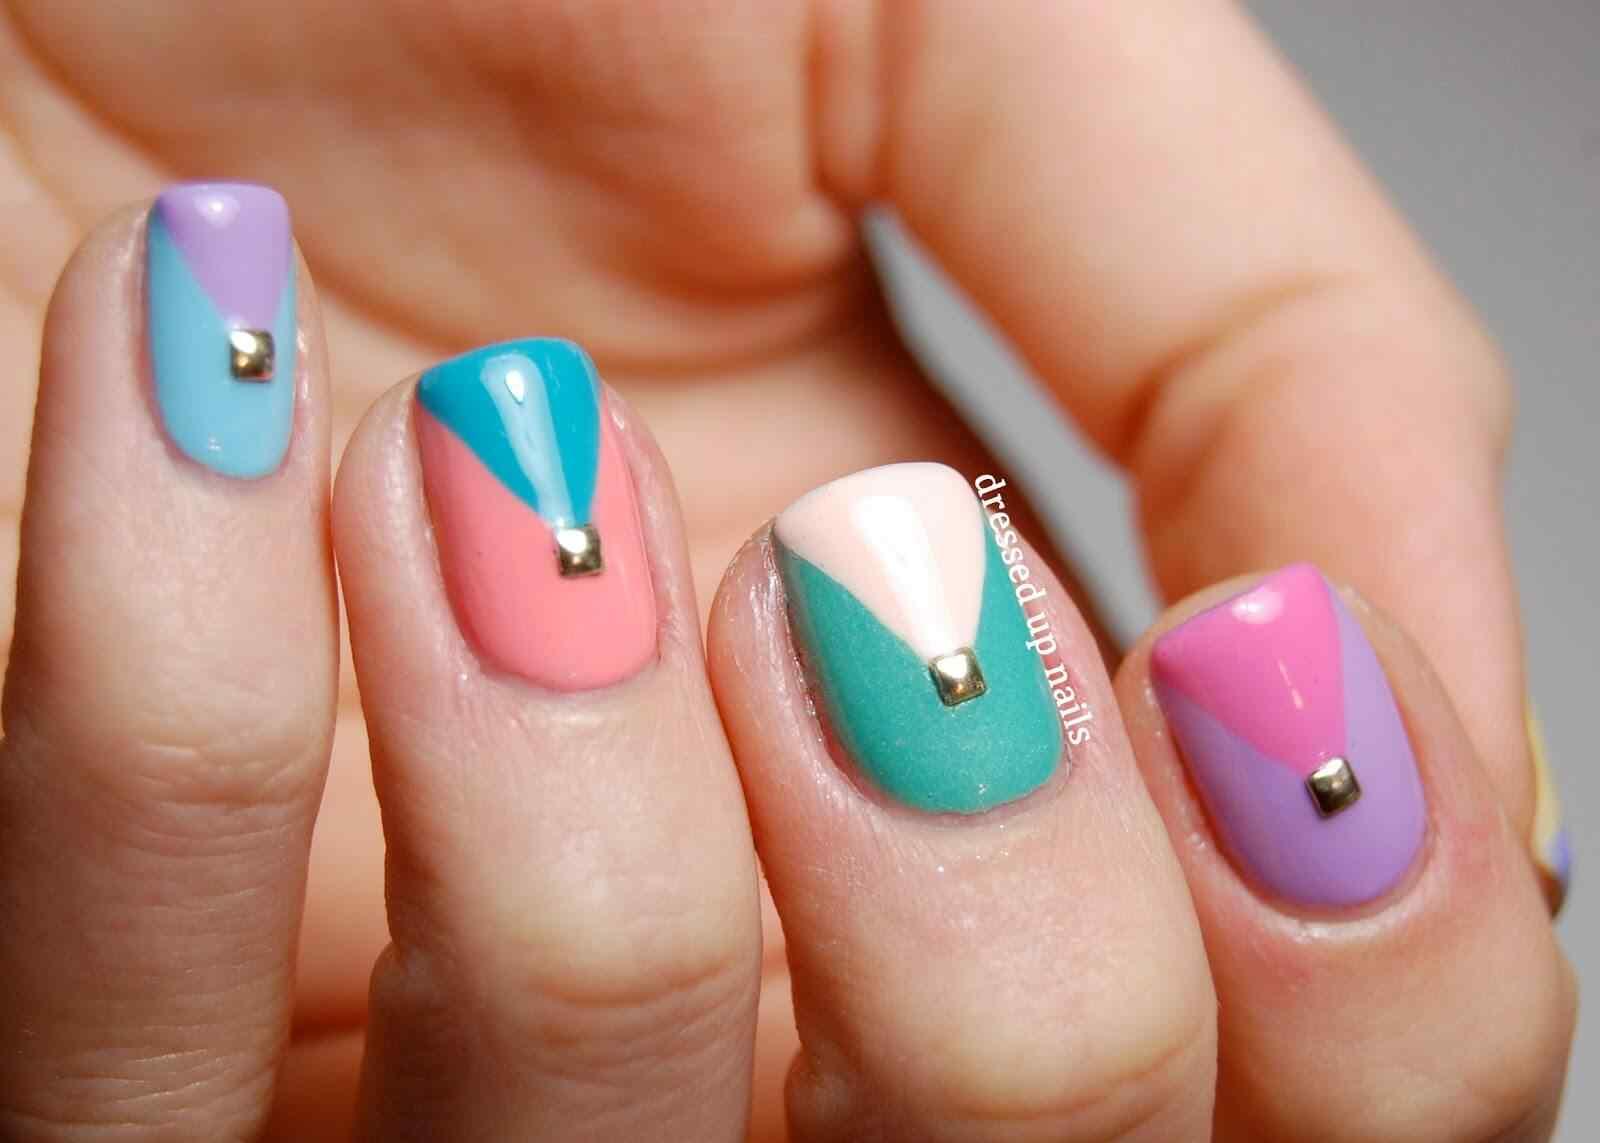 http://www.smackerlacquer.com/pastel-negative-space-nail-art/